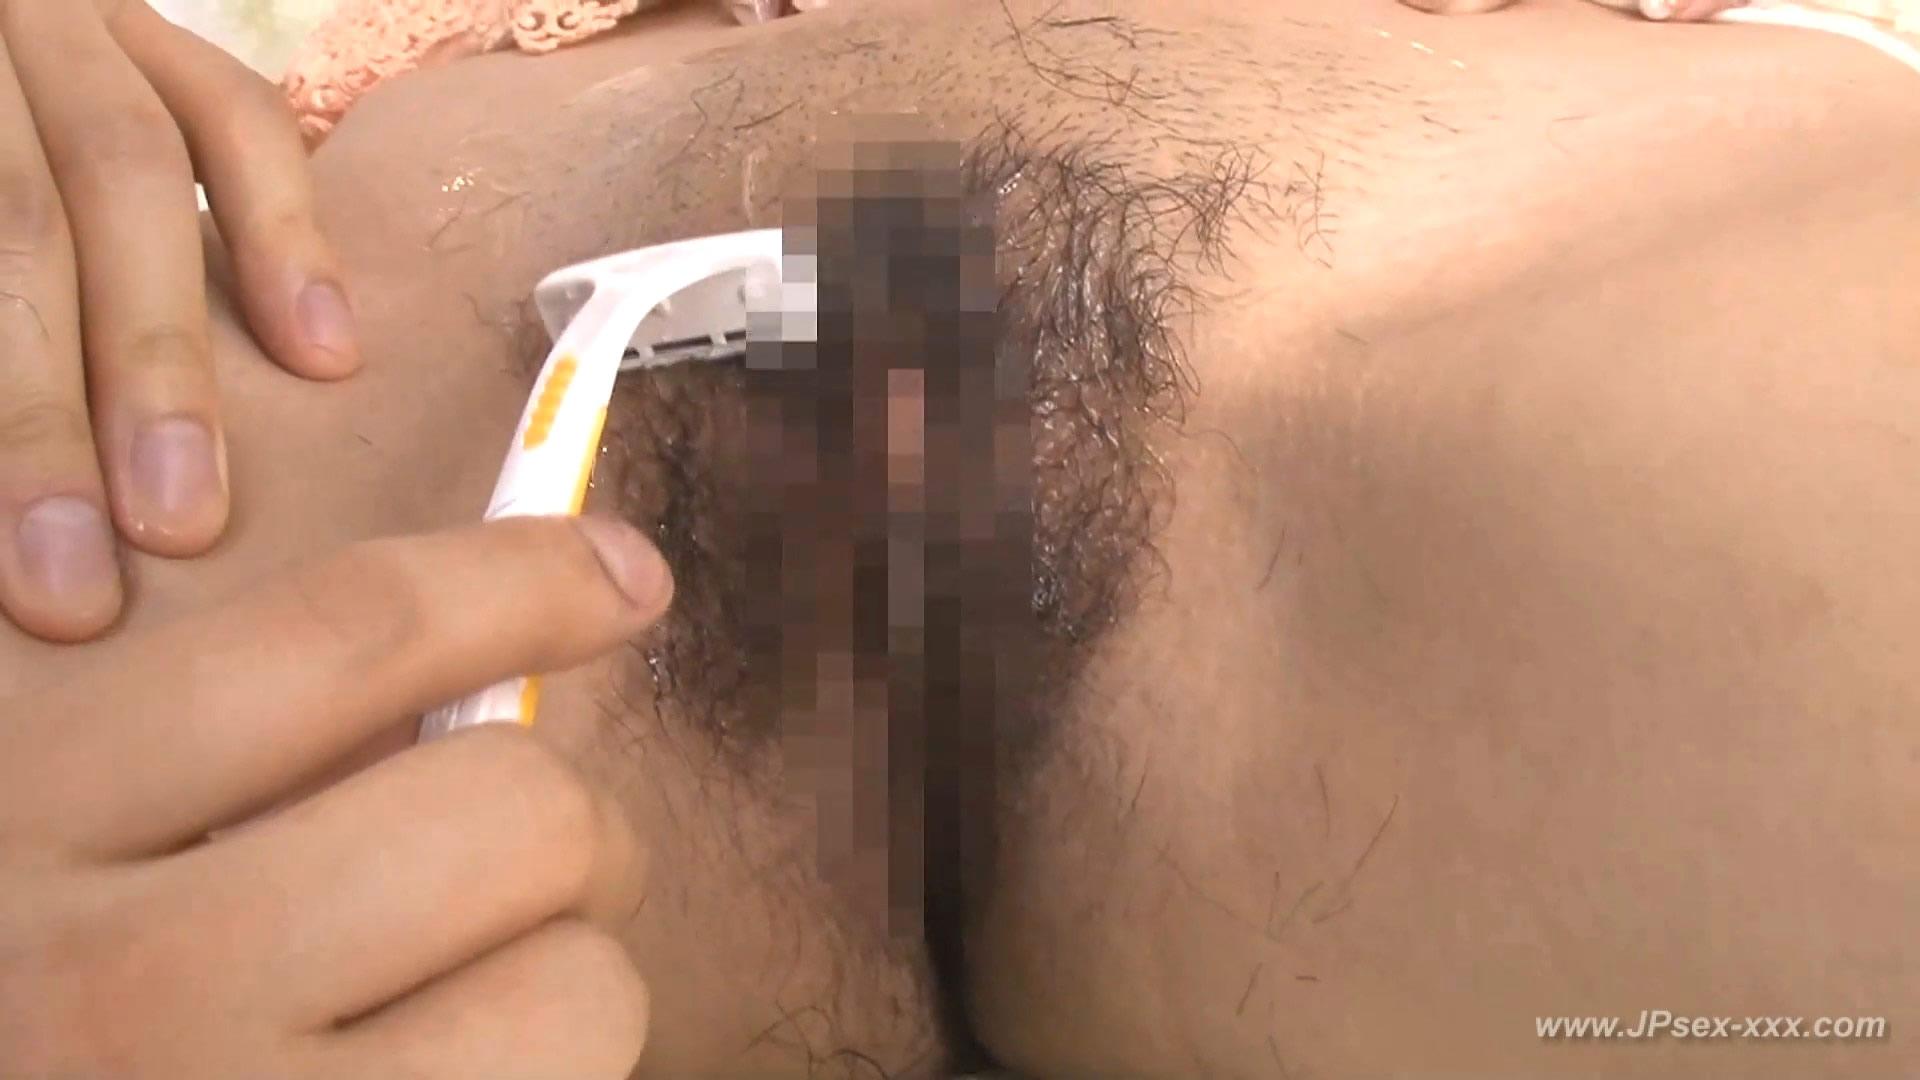 Kana Momonogi - First Shaving! Ultra Beautiful 5D Camera ...